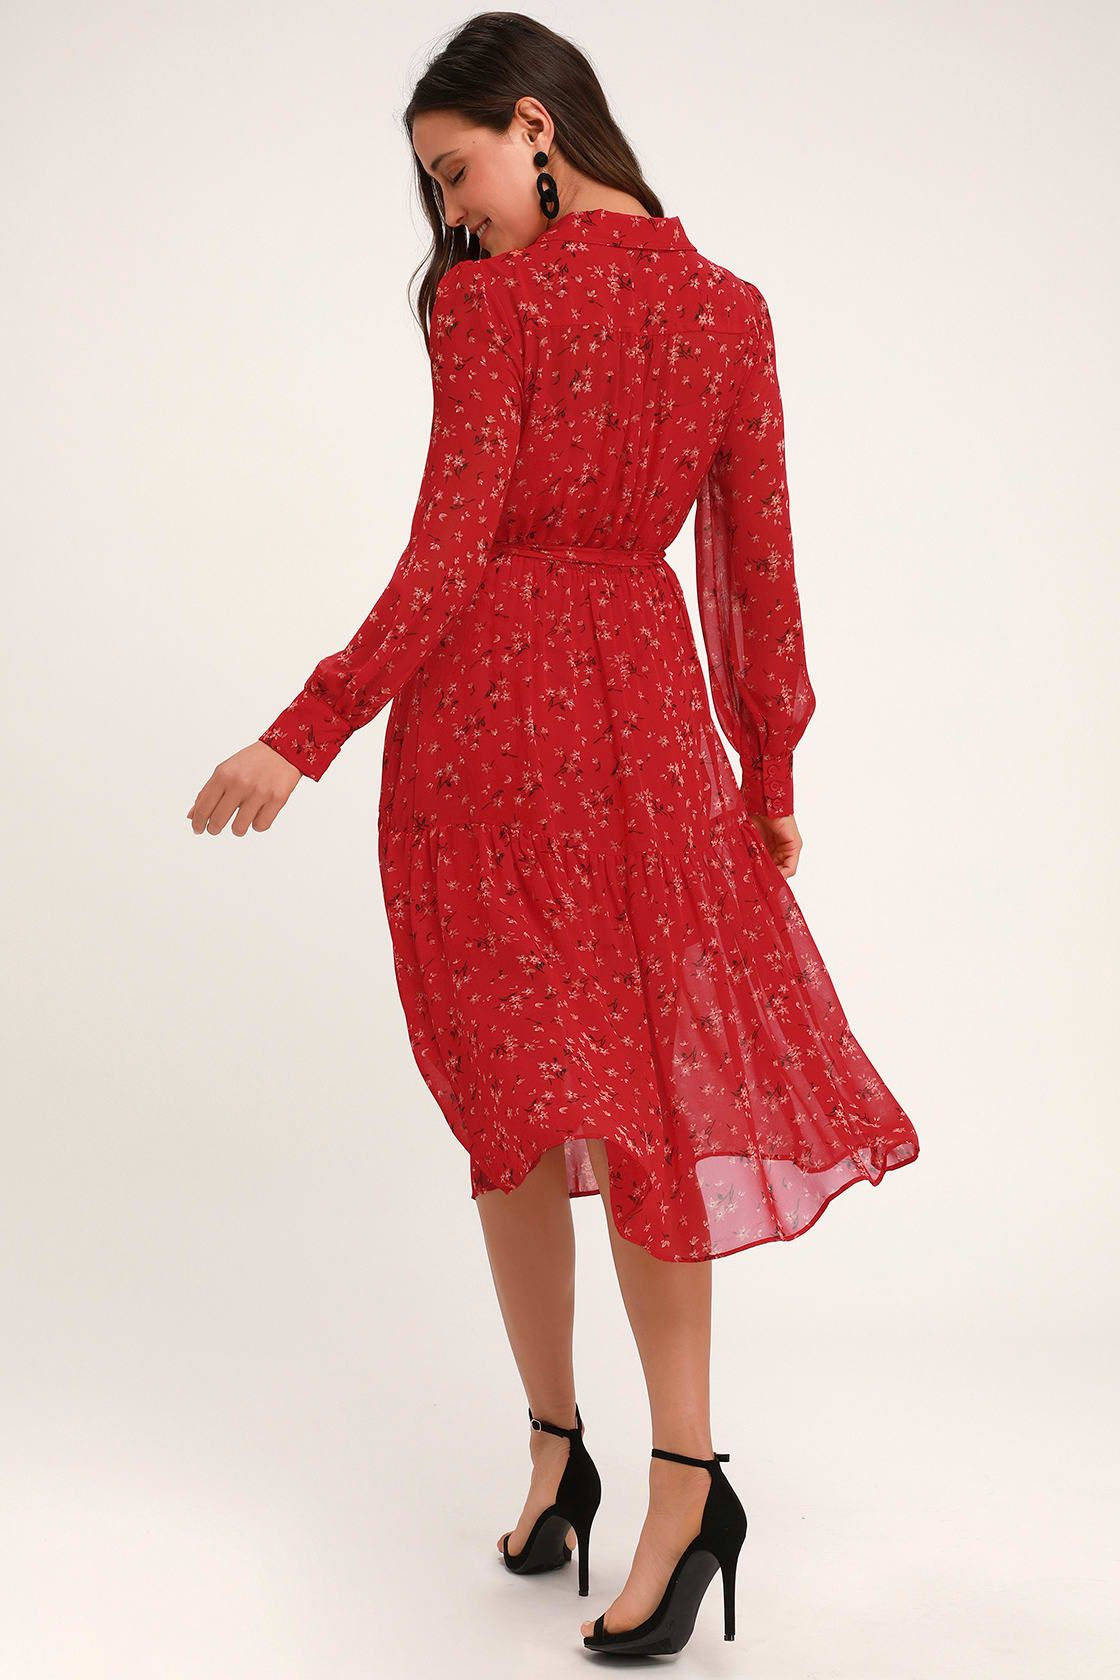 Flirt Fest Red Floral Print Long Sleeve Midi Dress Women Dress Online Long Sleeve Midi Dress Red Floral Print Dress [ 1680 x 1120 Pixel ]